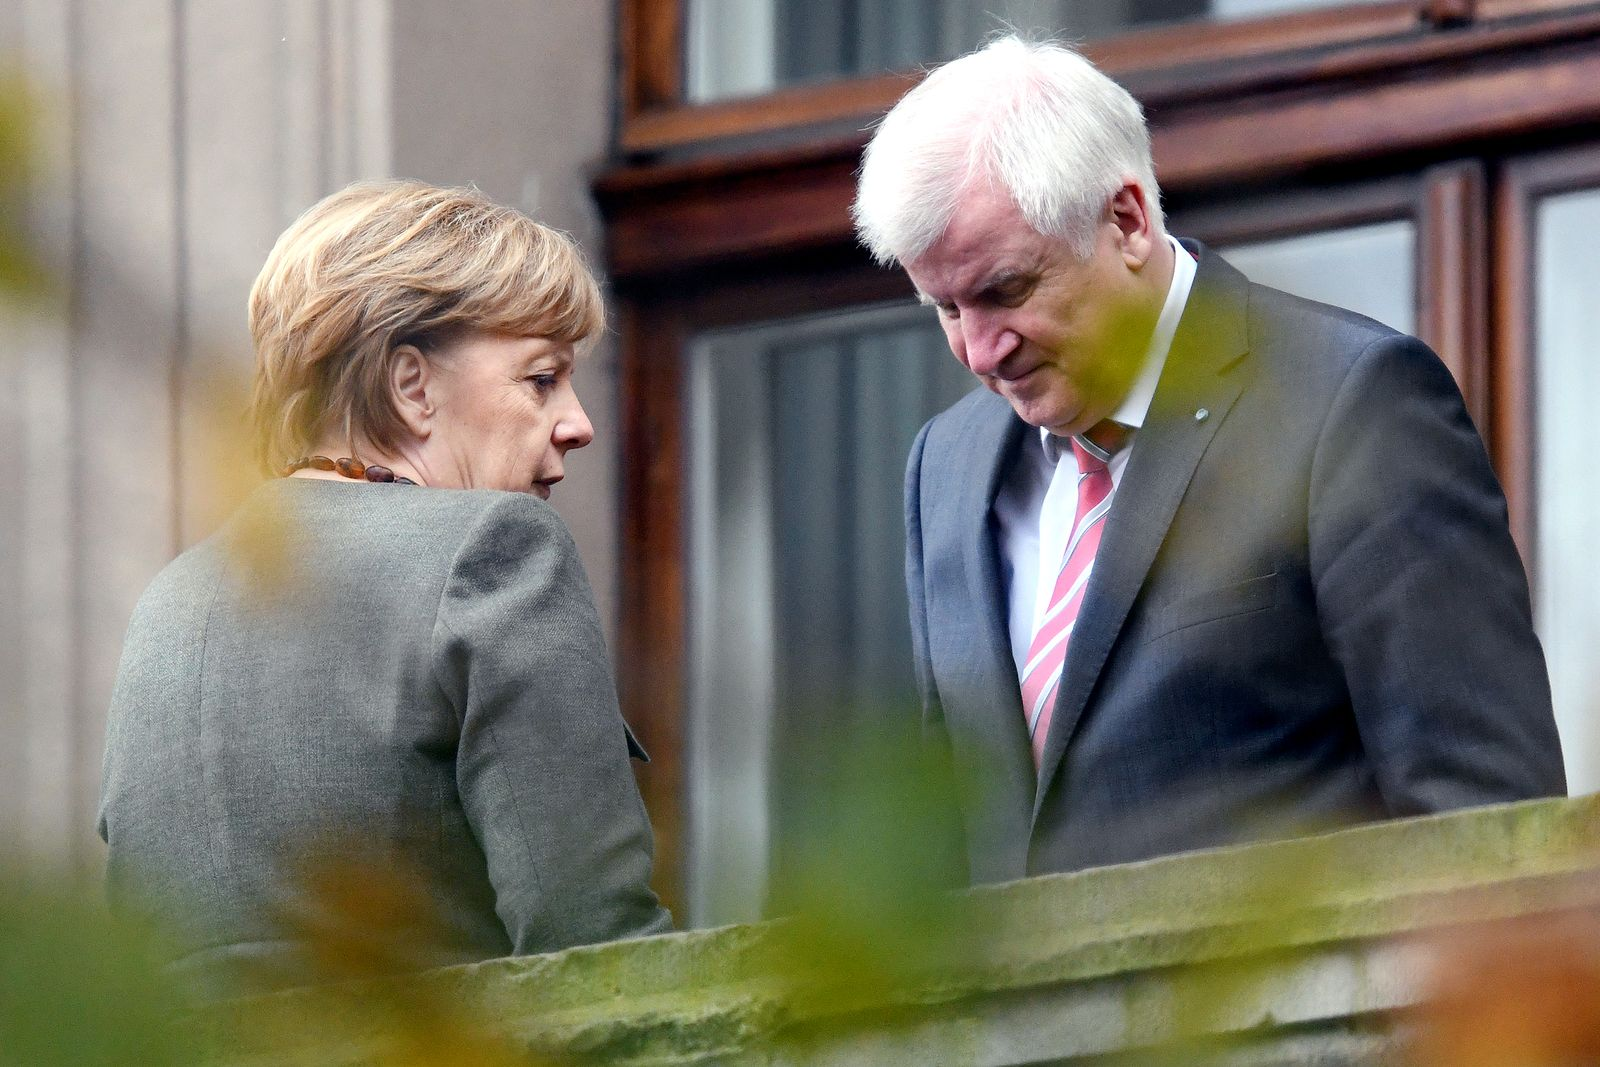 Merkel & Seehofer